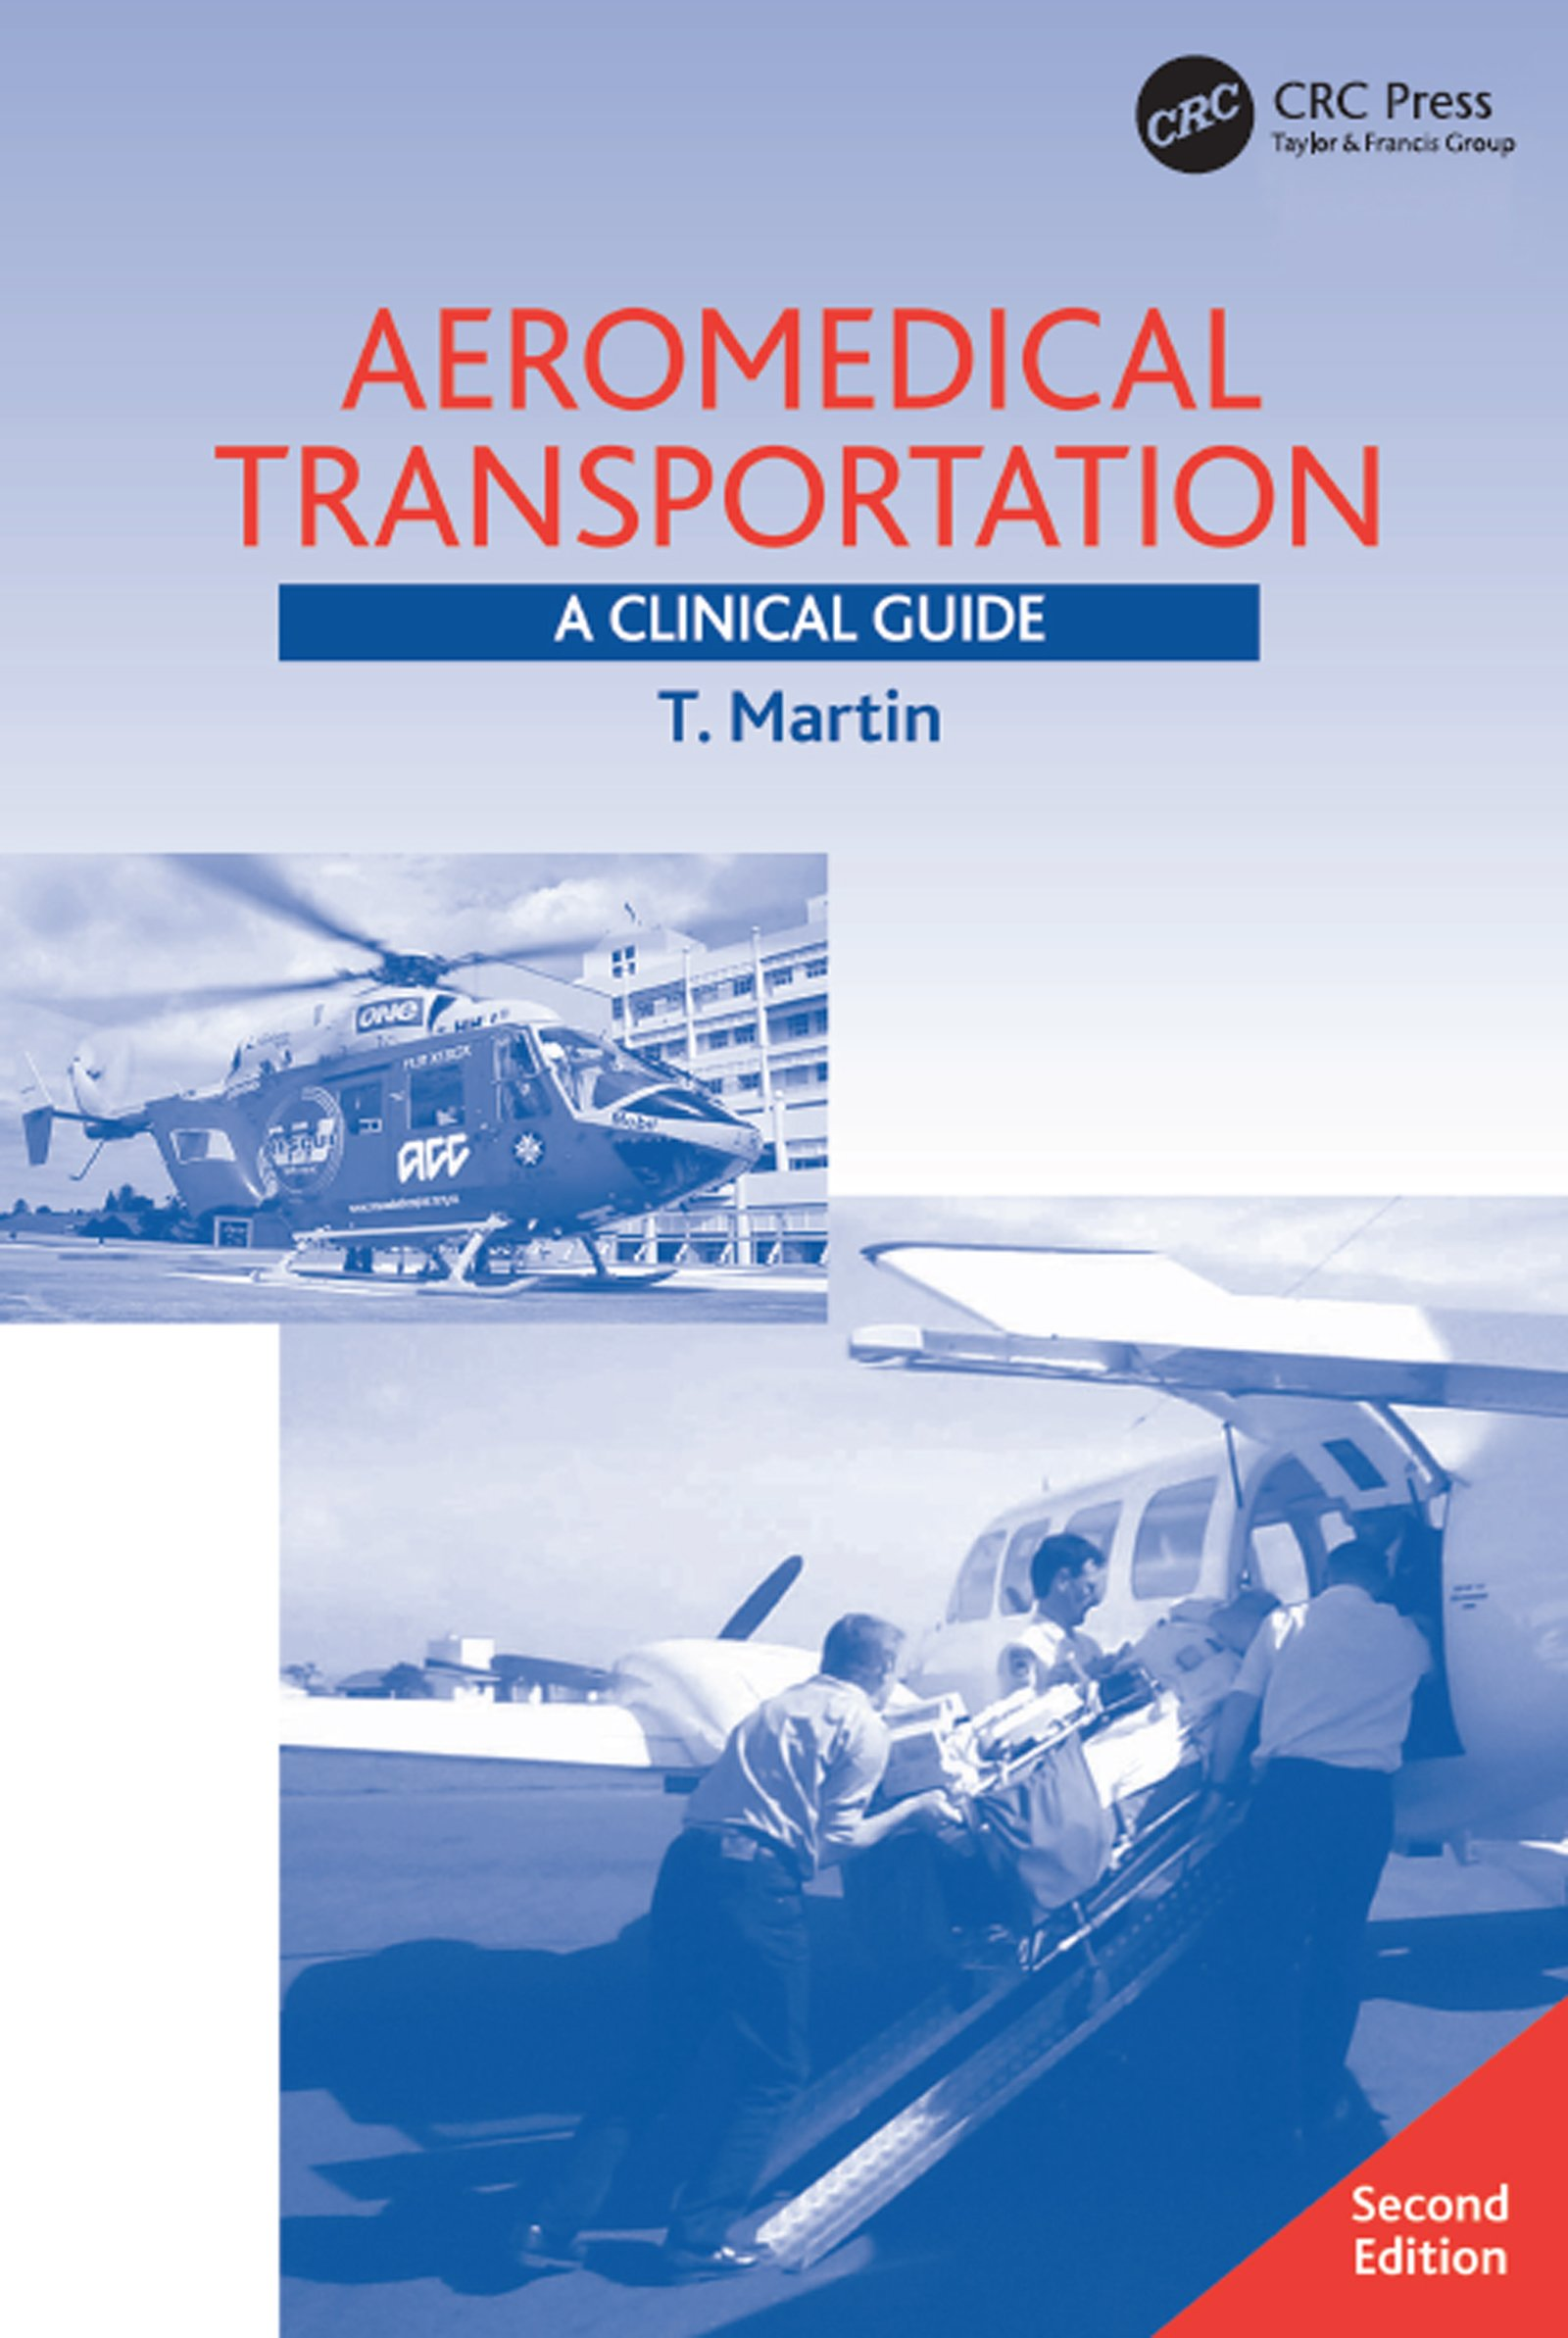 Aeromedical Transportation: A Clinical Guide (English Edition)